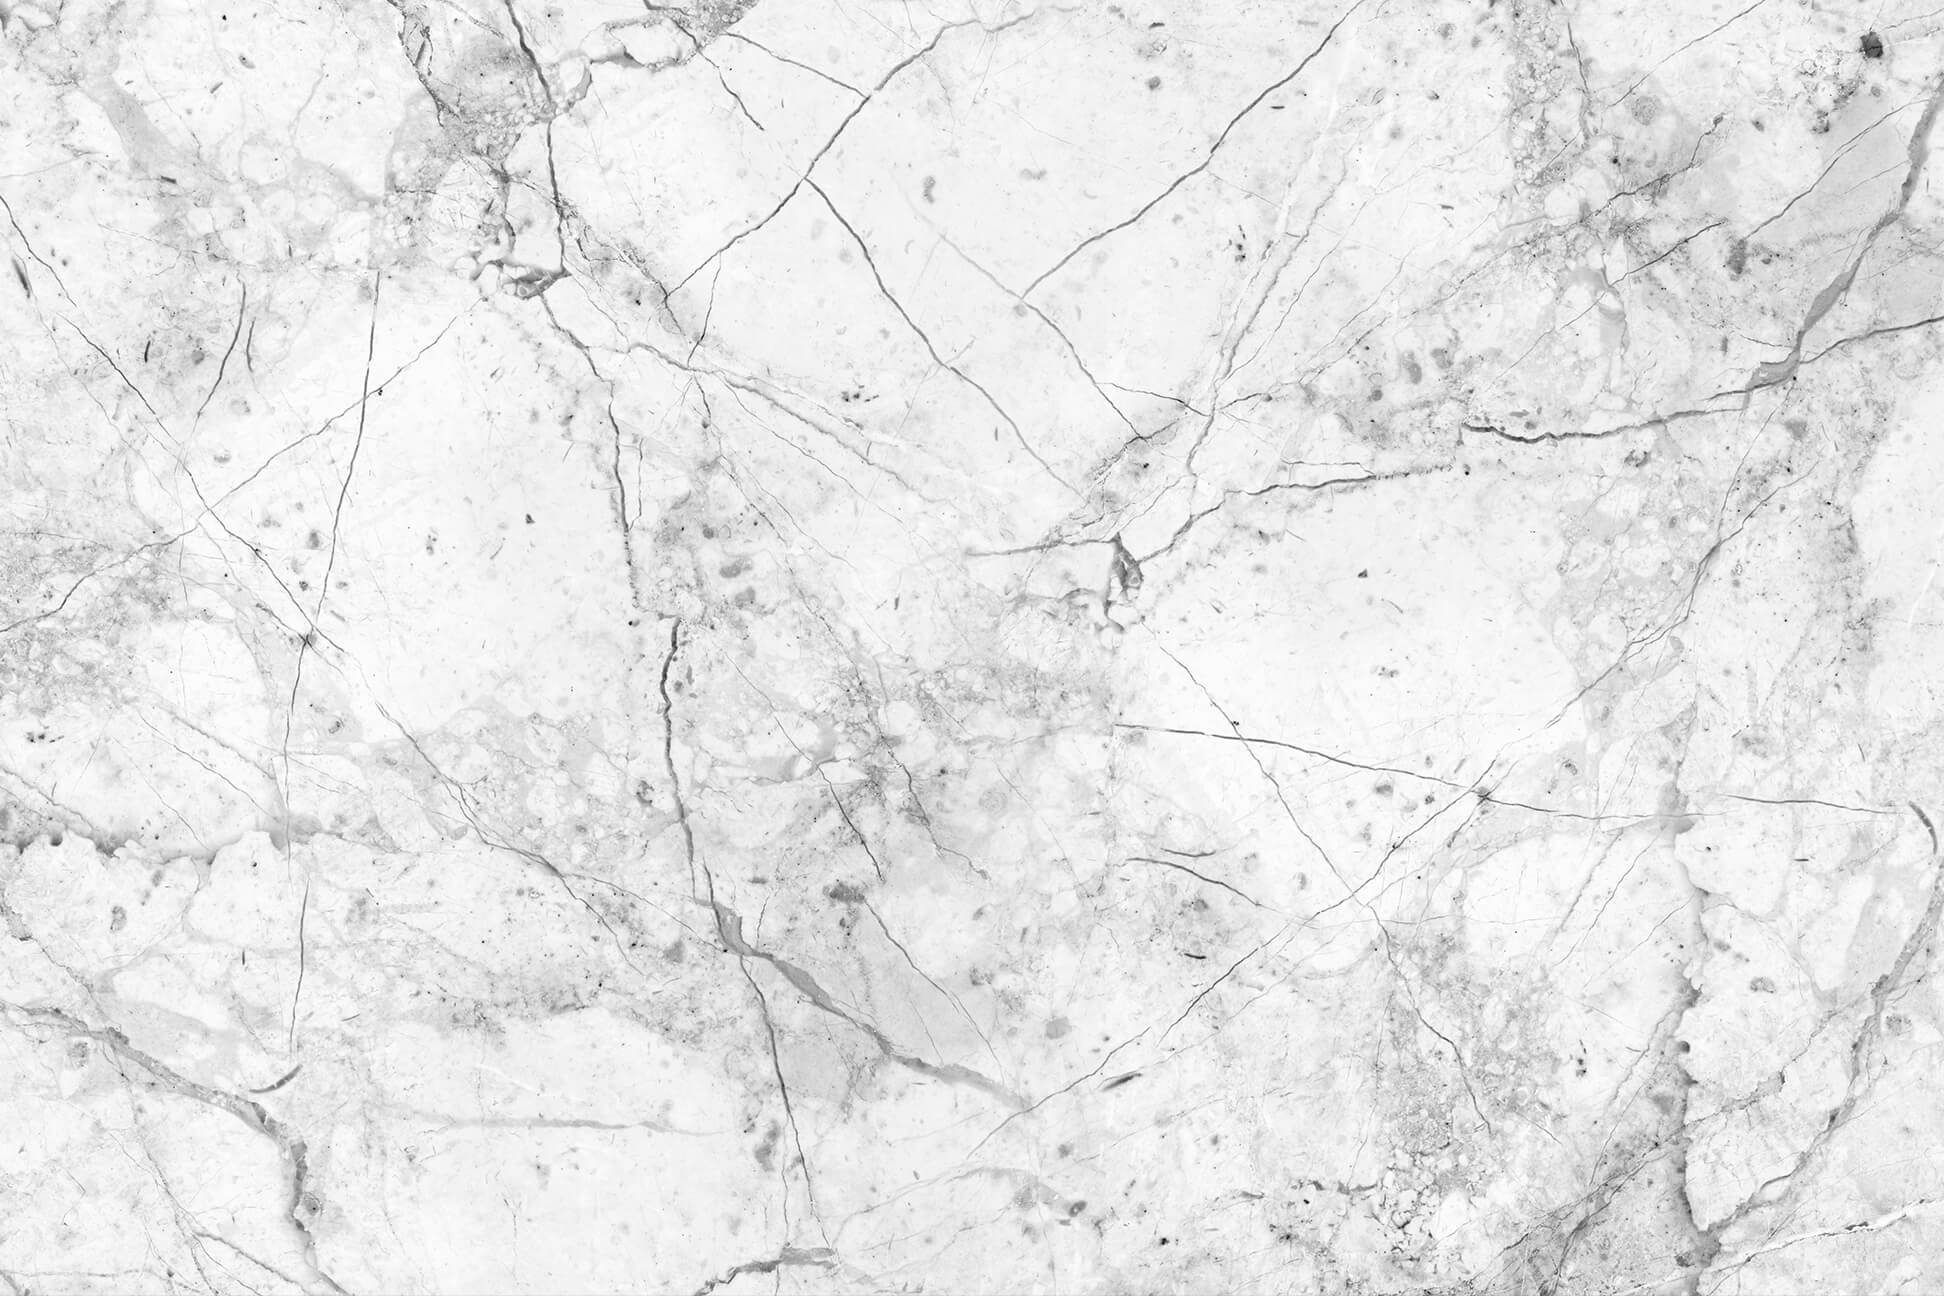 Best Wallpaper Marble Plain - ba52ee2be4920ab6c1a5a9a29d9e41e7  Pic_44328.jpg